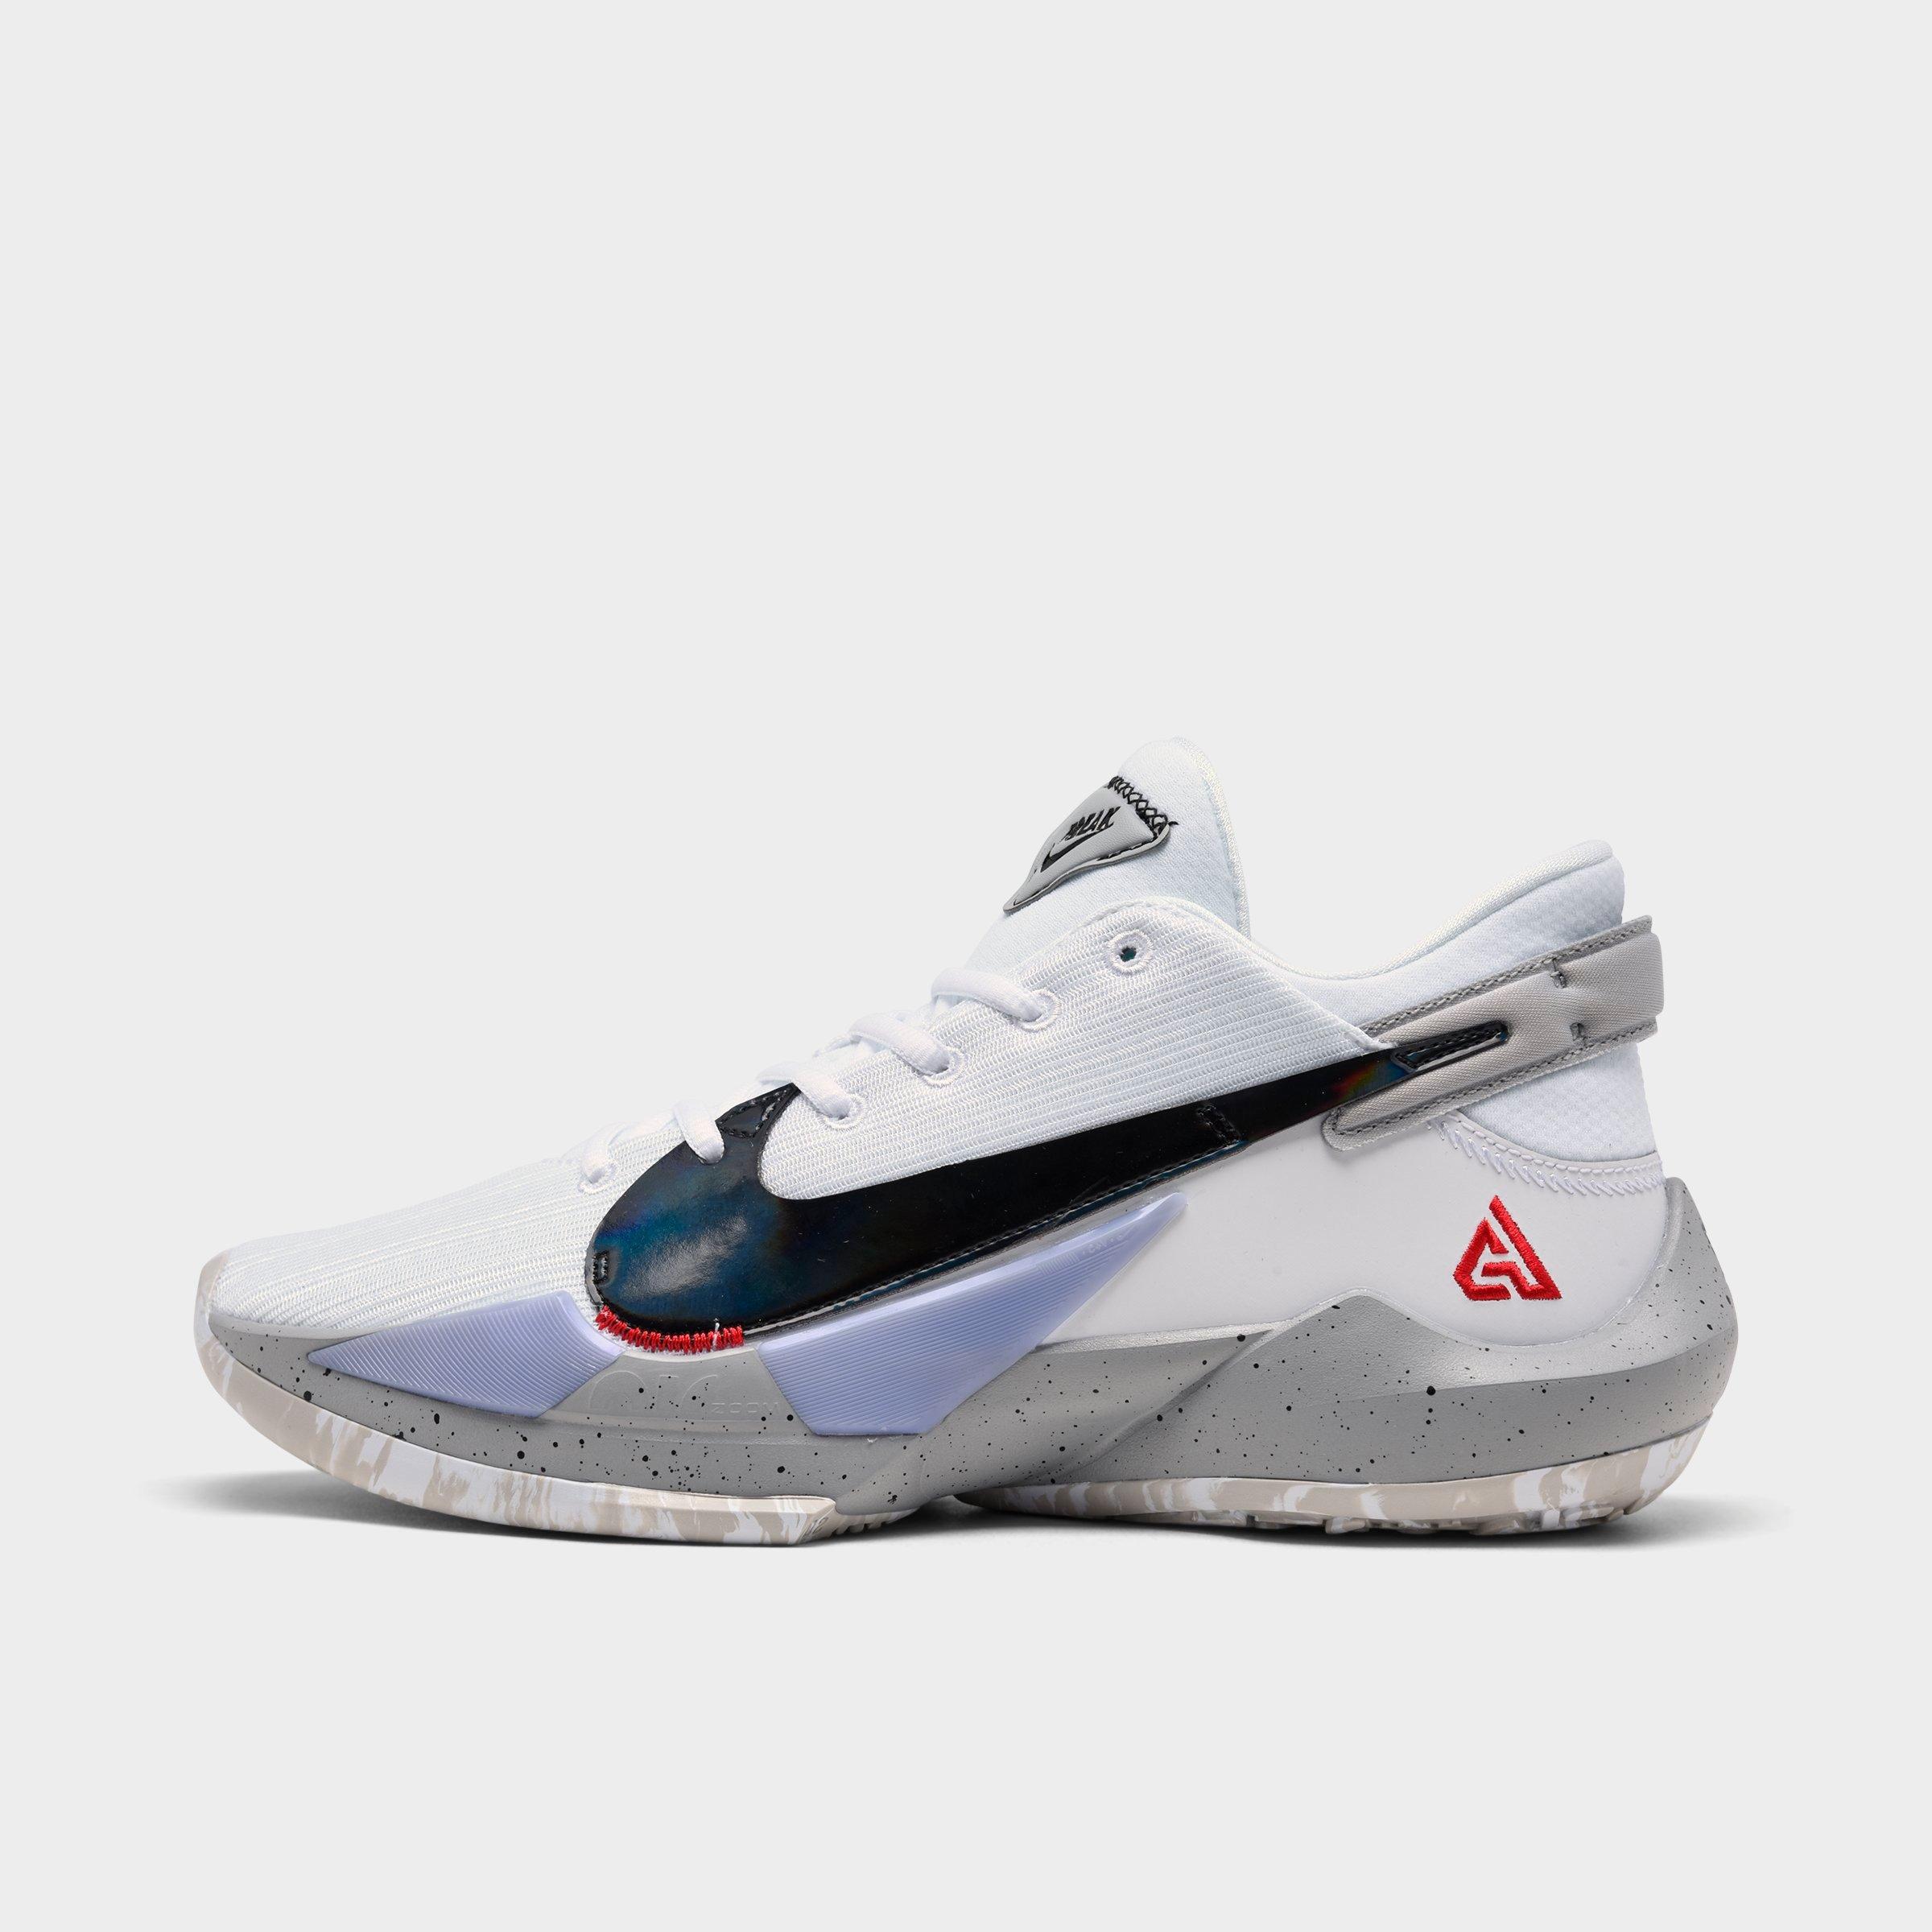 Nike Men's Zoom Freak 2 Basketball Shoes in White Size 8.5 ...